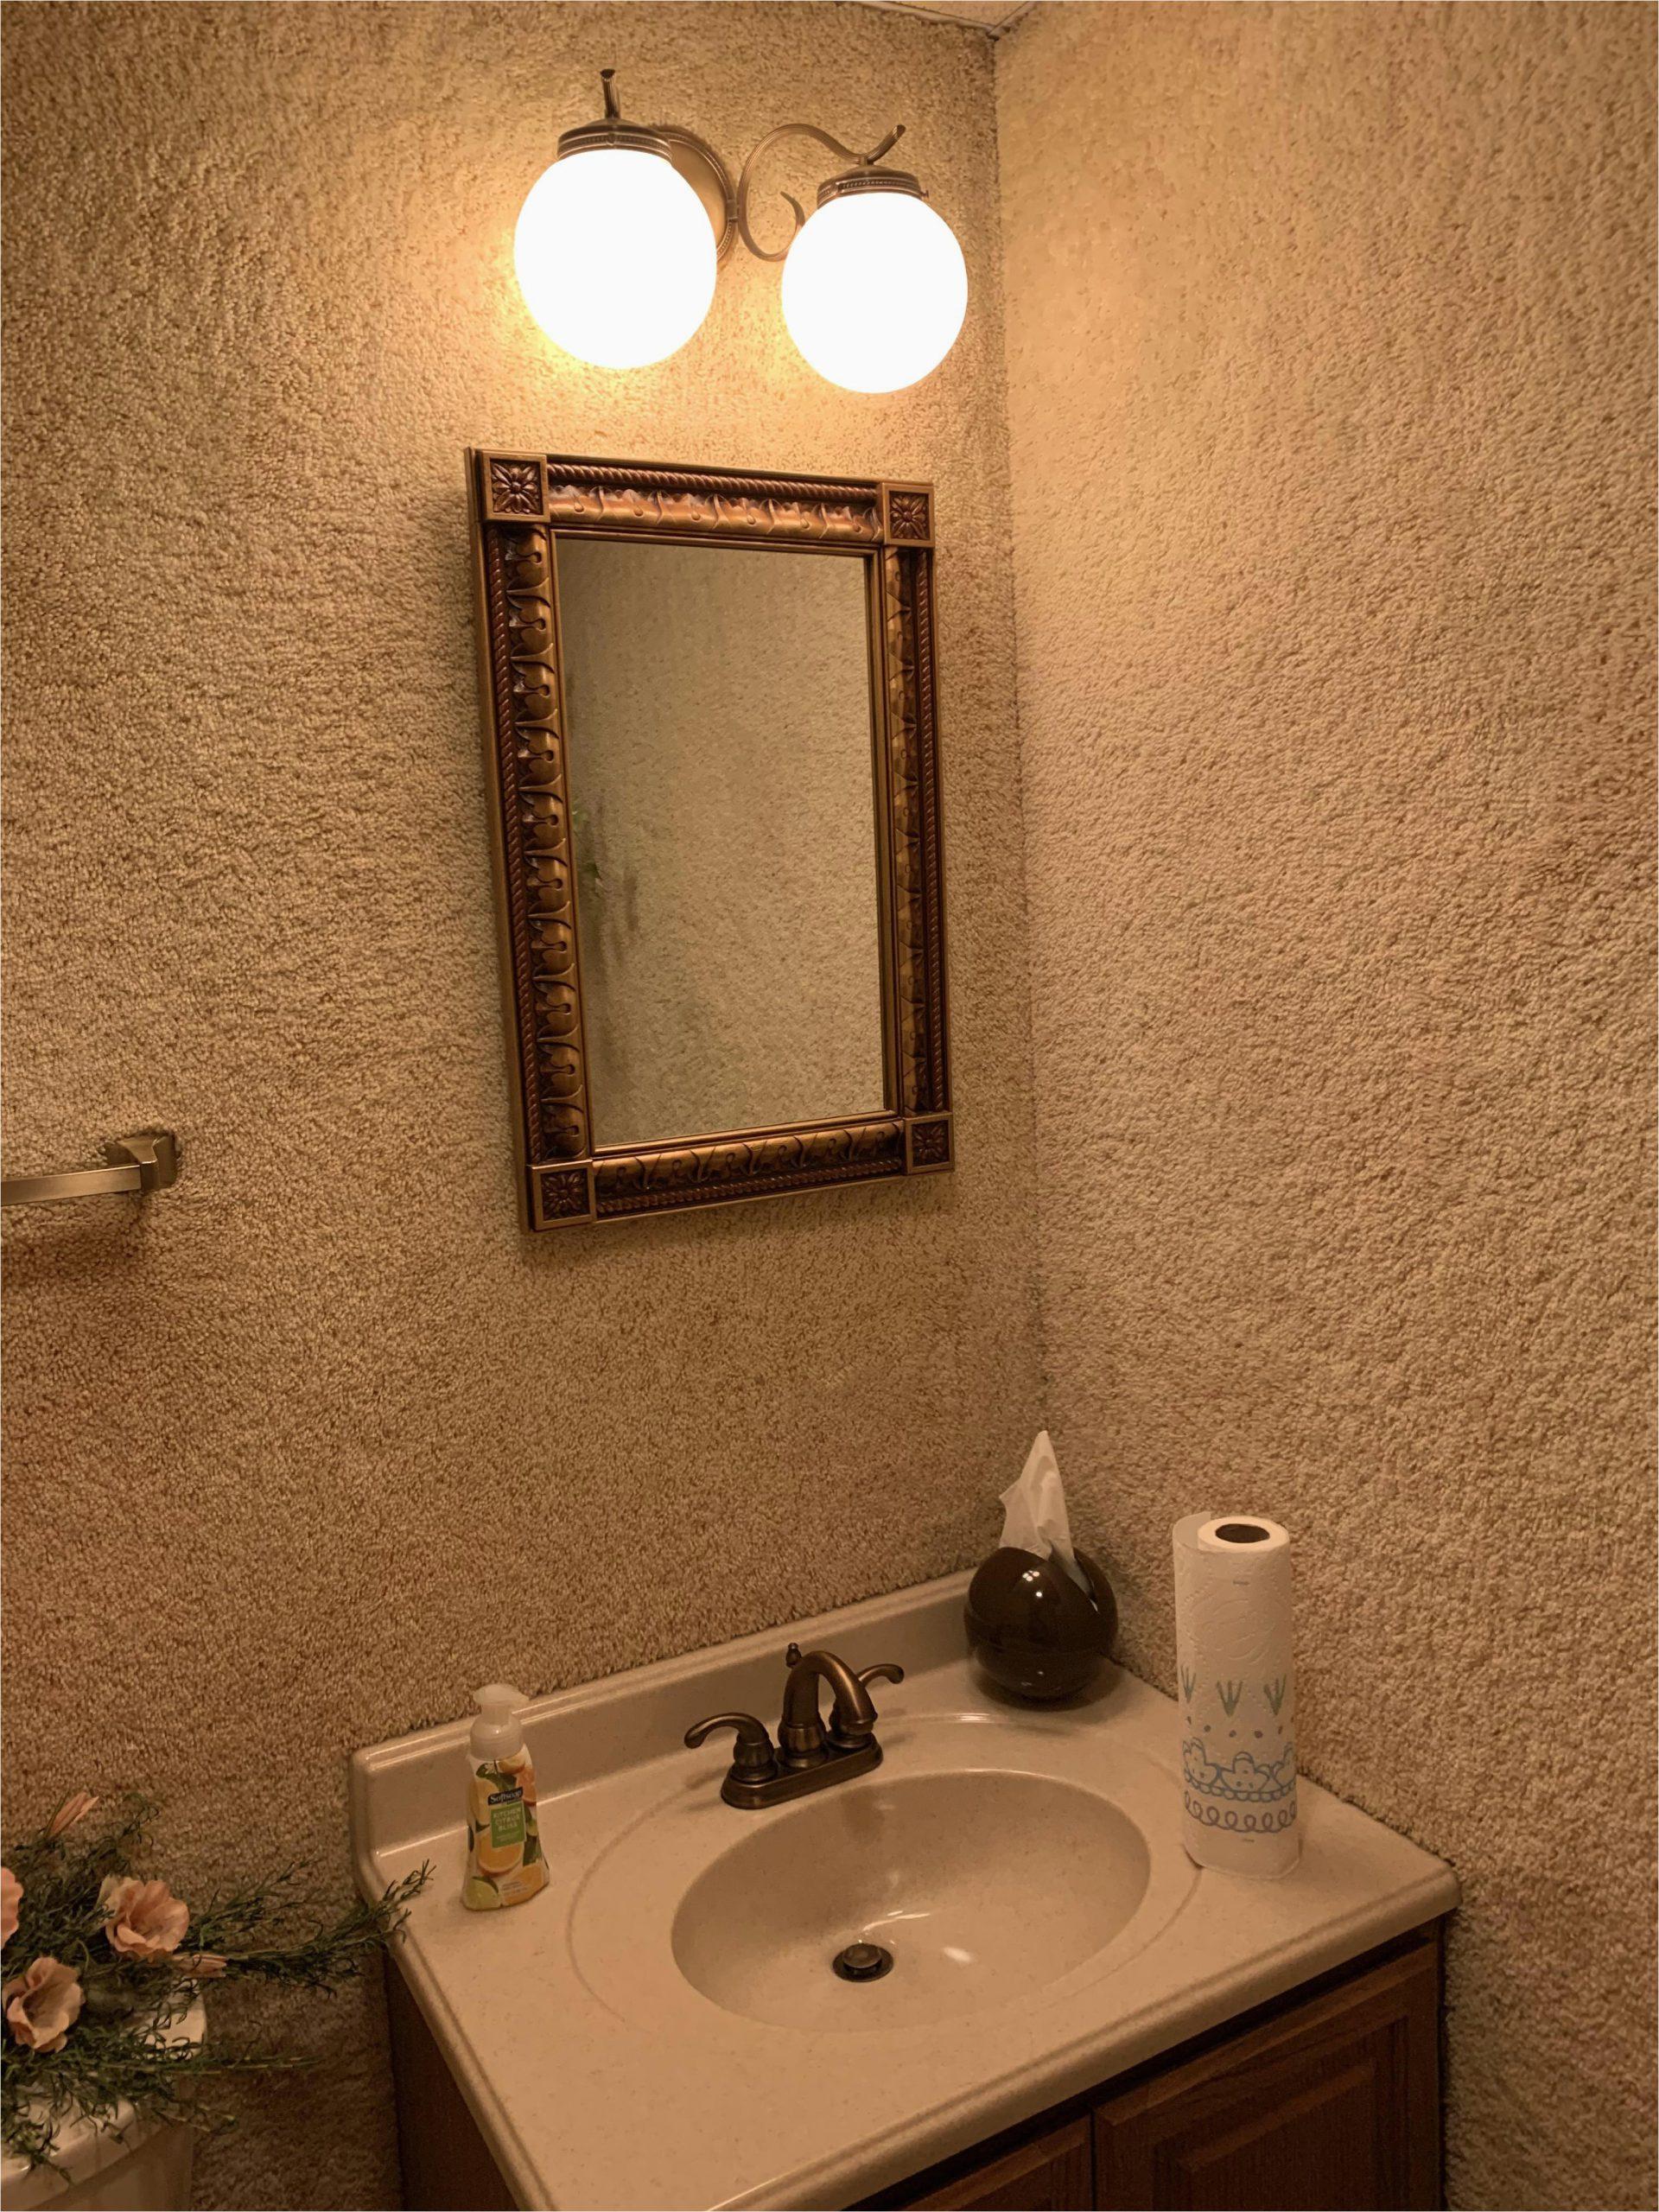 saw the last carpet in the bathroom so i raise